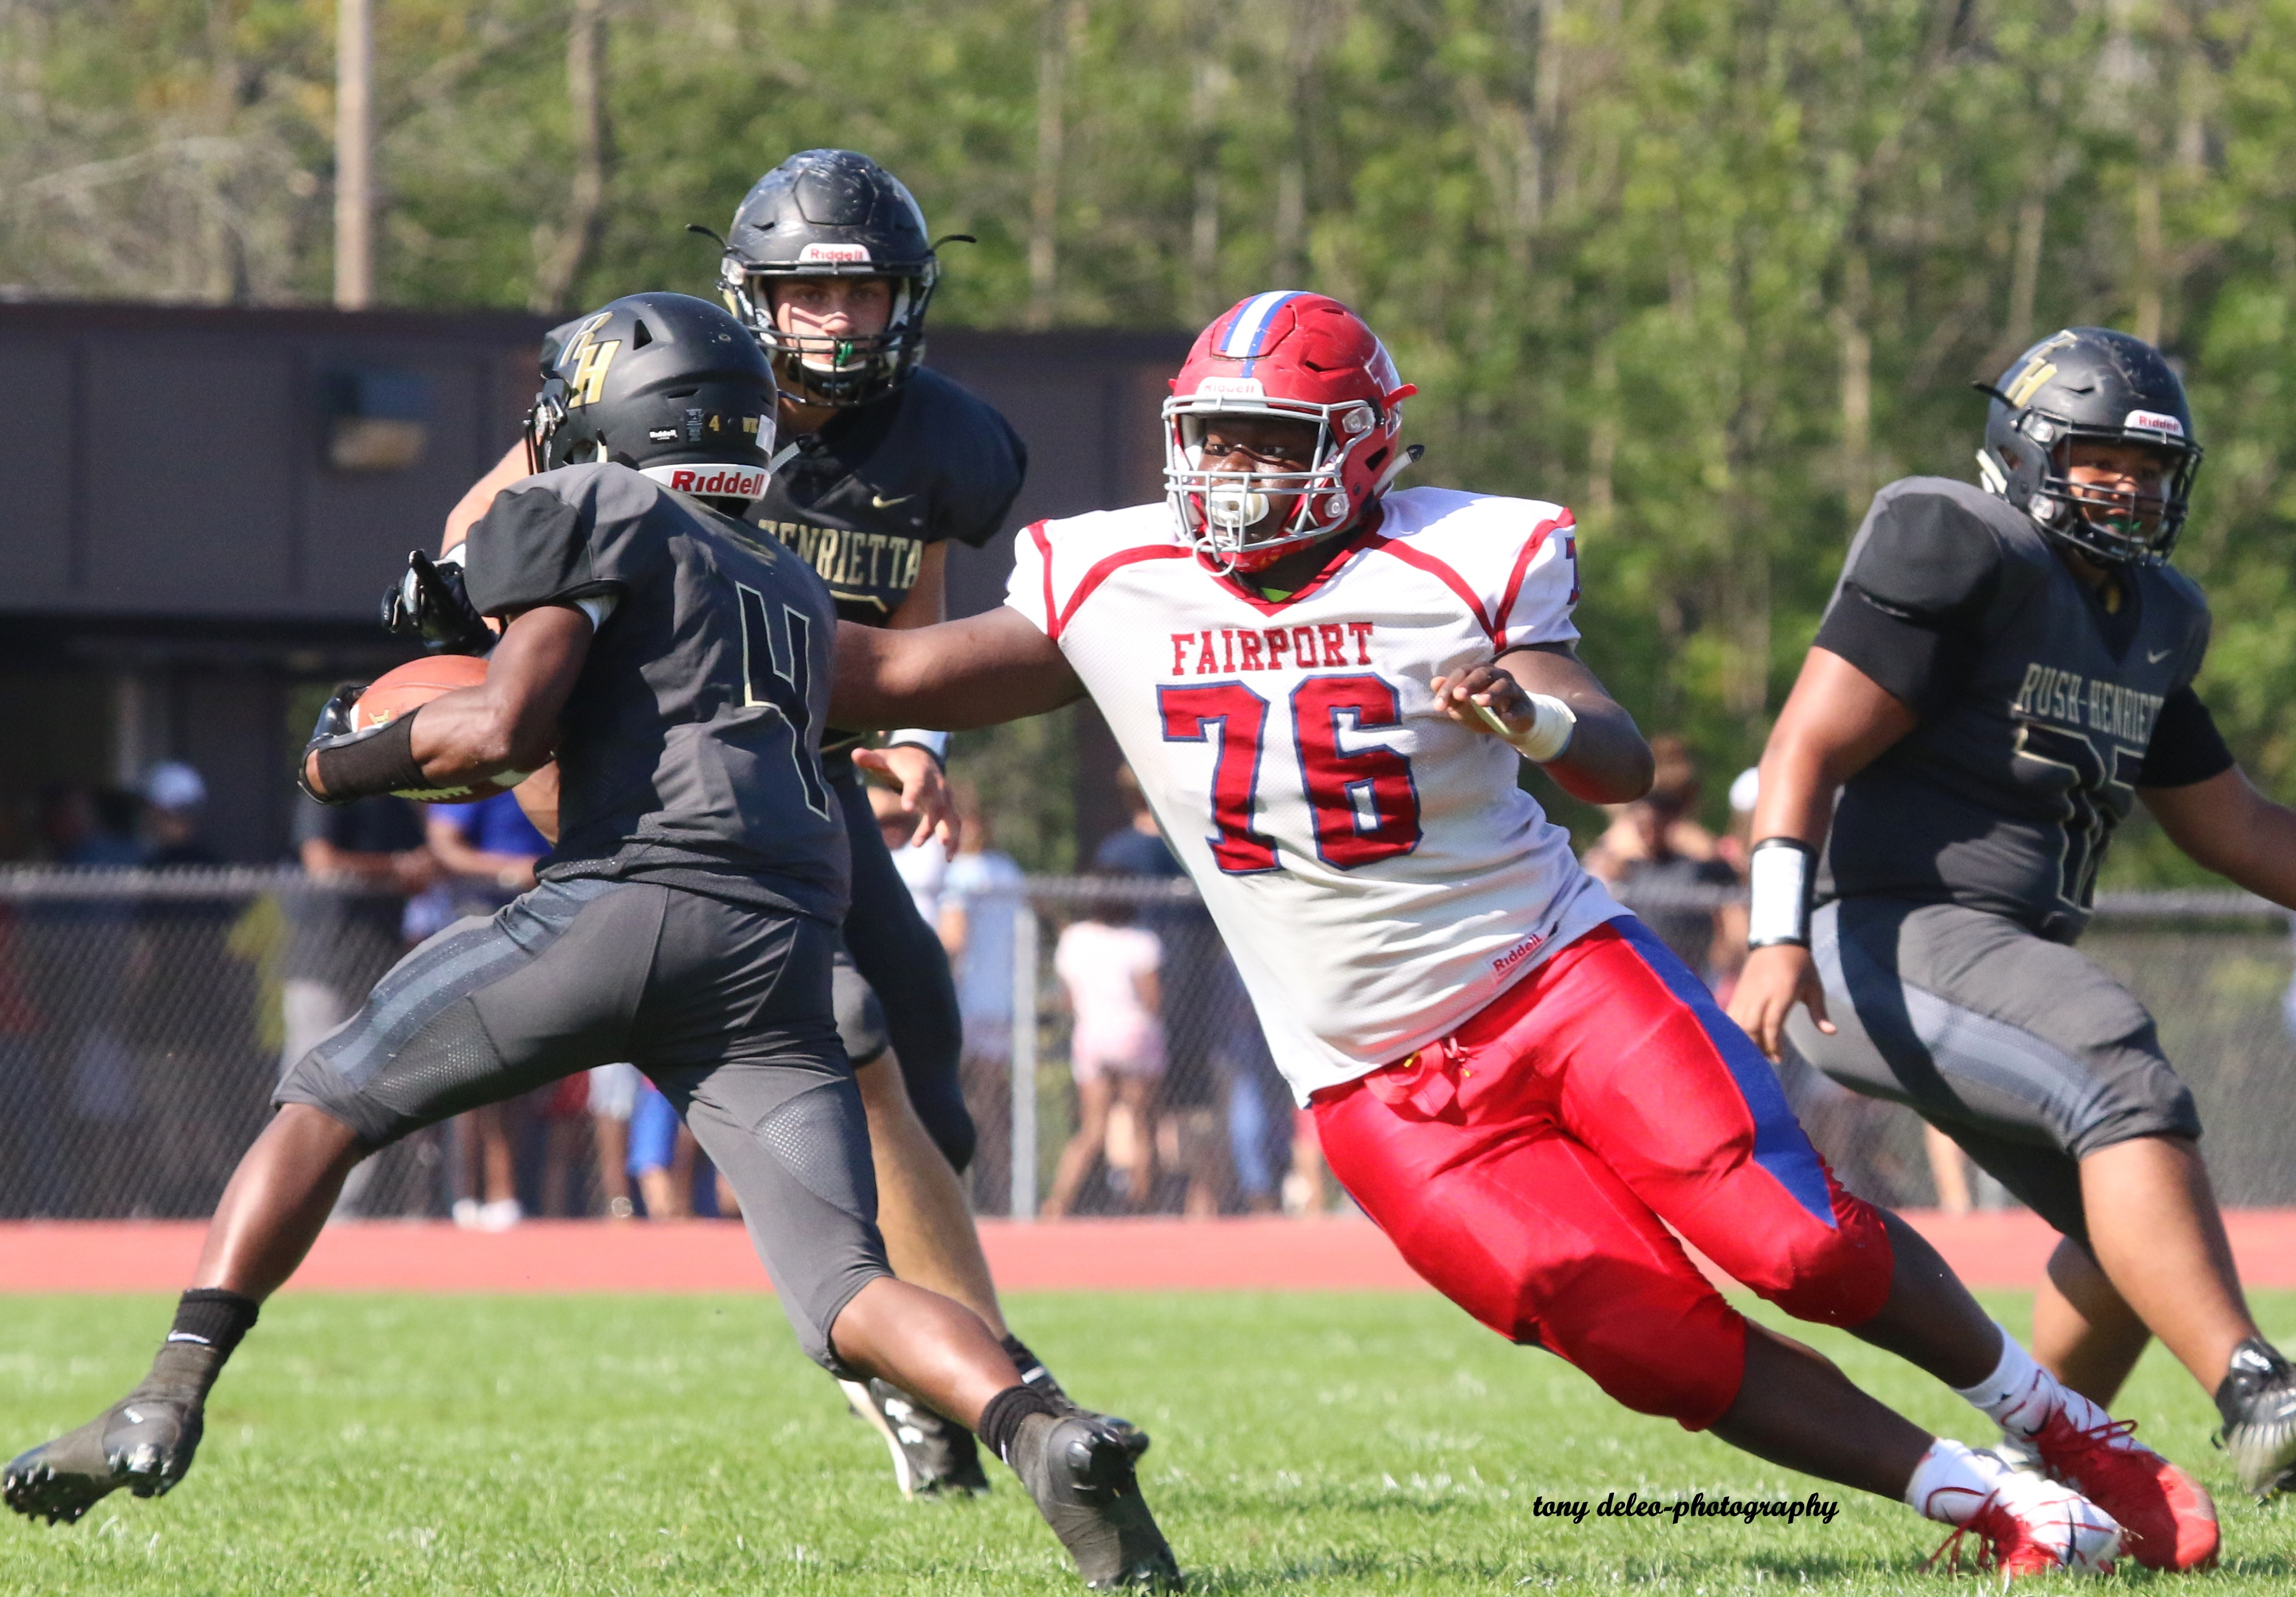 Monroe County Division I Football: Kessington shines on defense